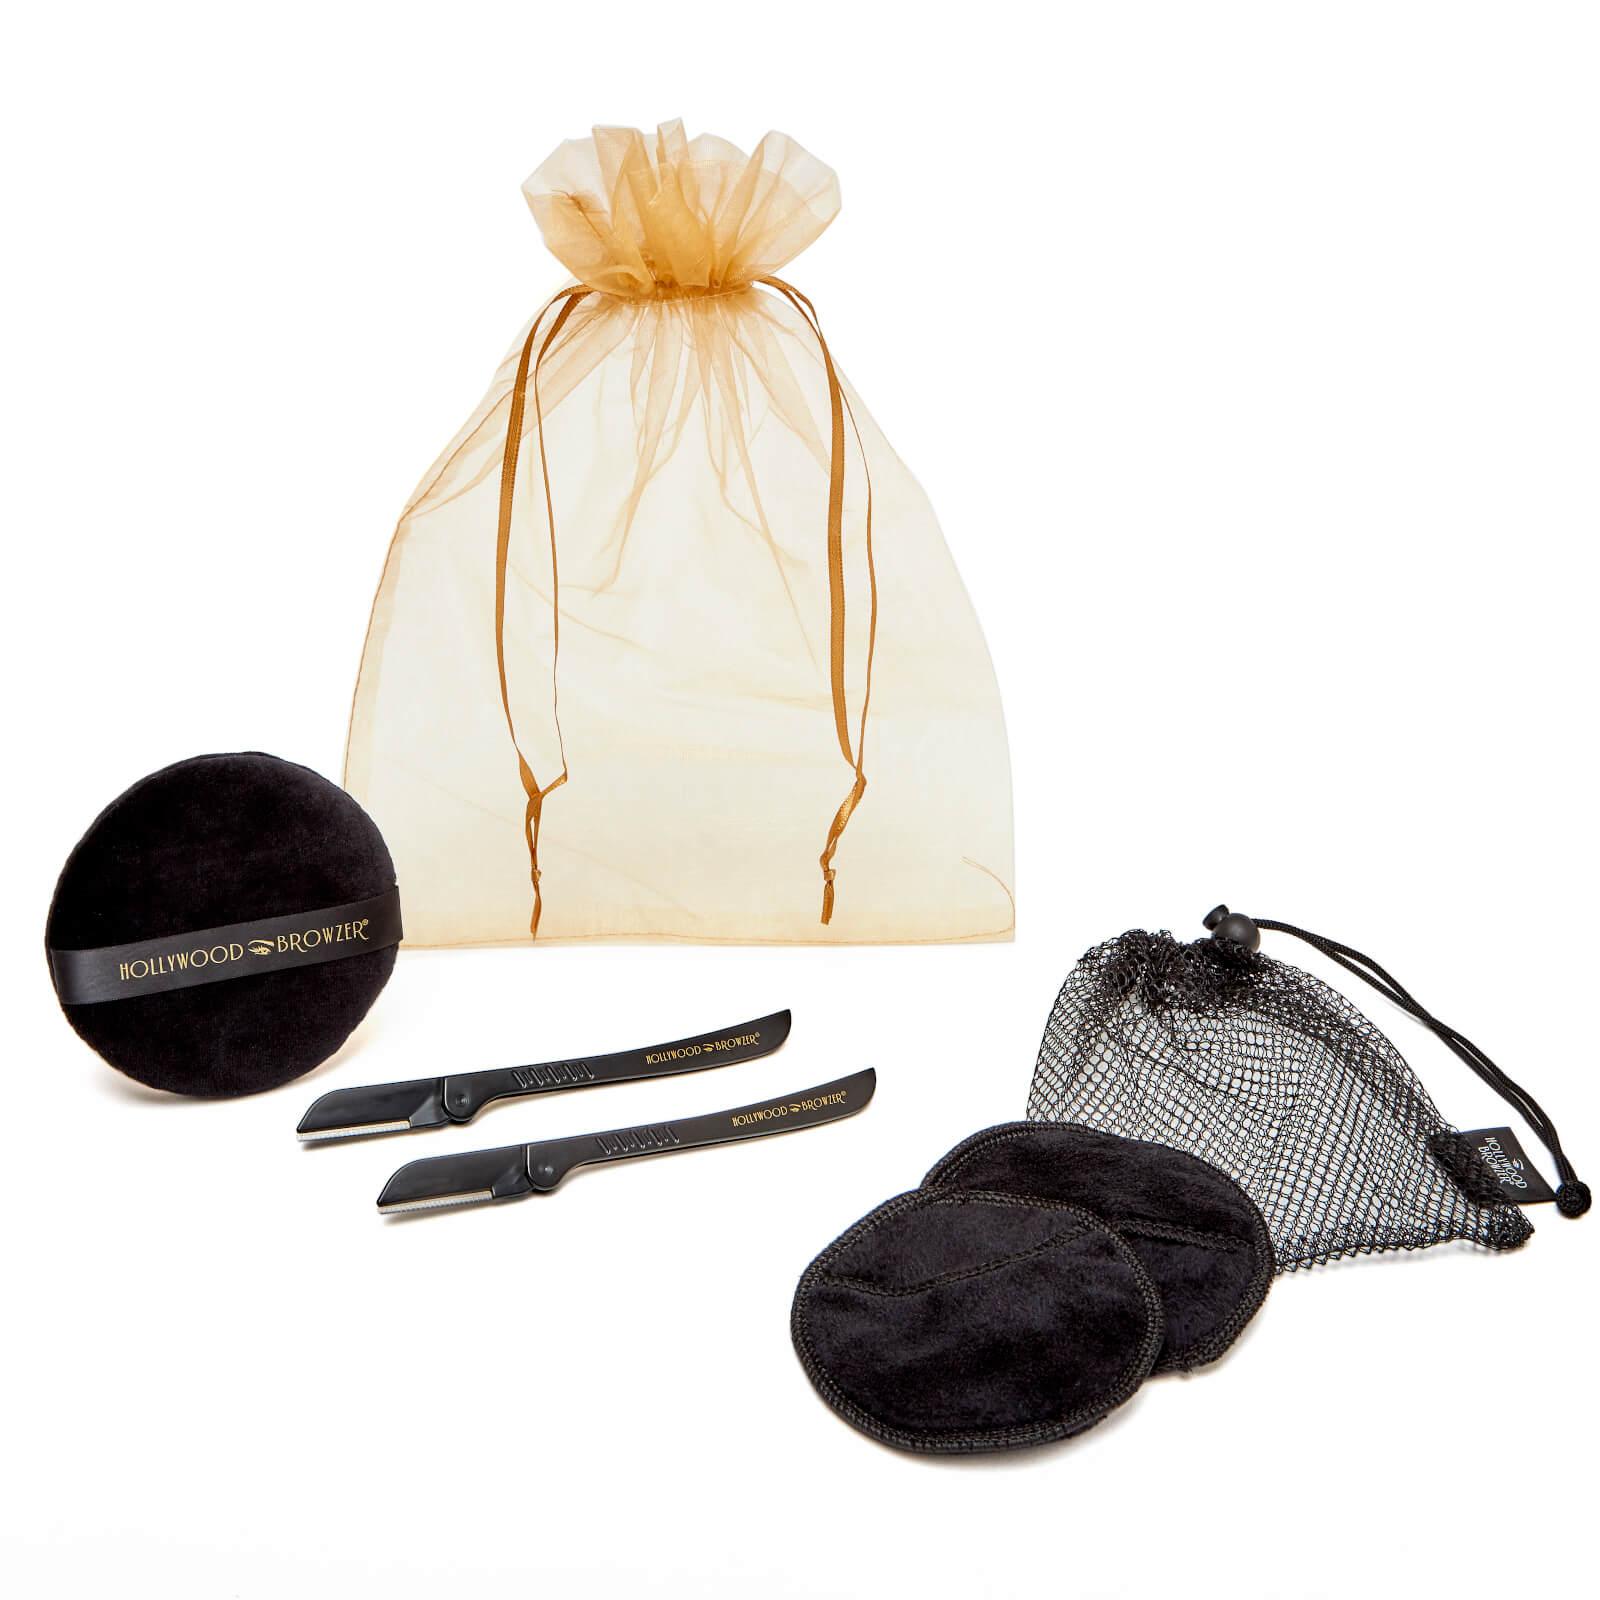 Купить Hollywood Browzer Dermaplaning Facial Kit Duo - Black